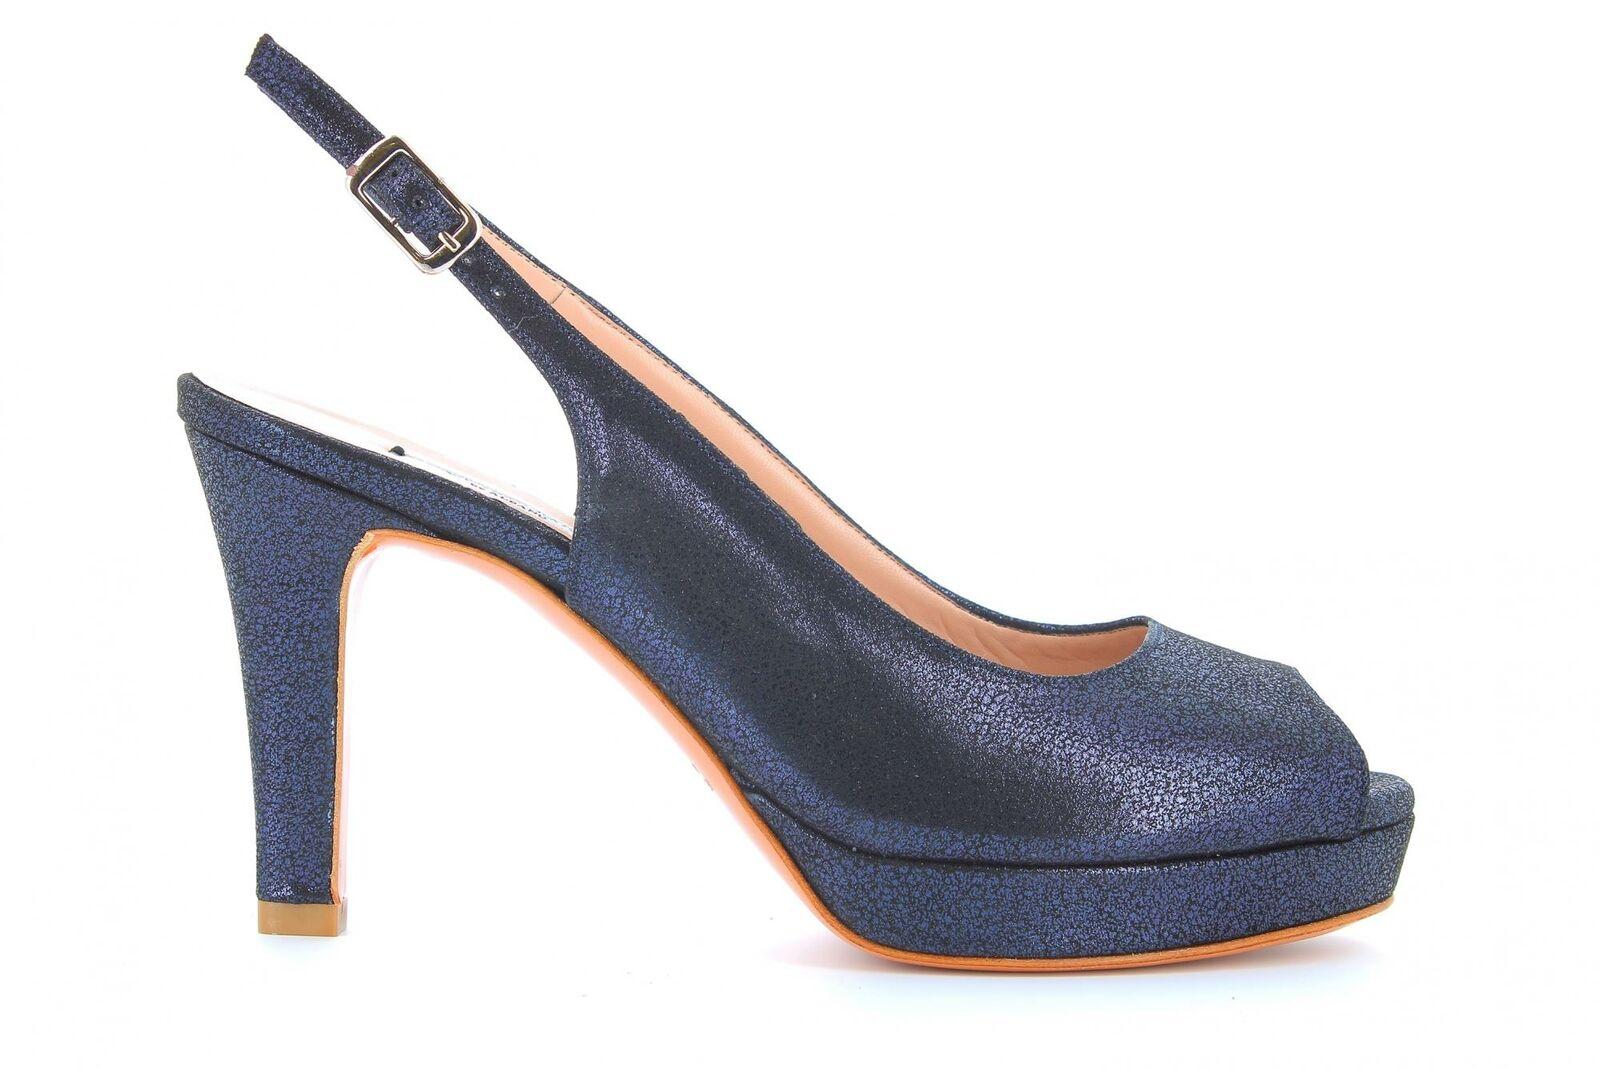 L'Amour P19g skor kvinna sandal 951 Blå